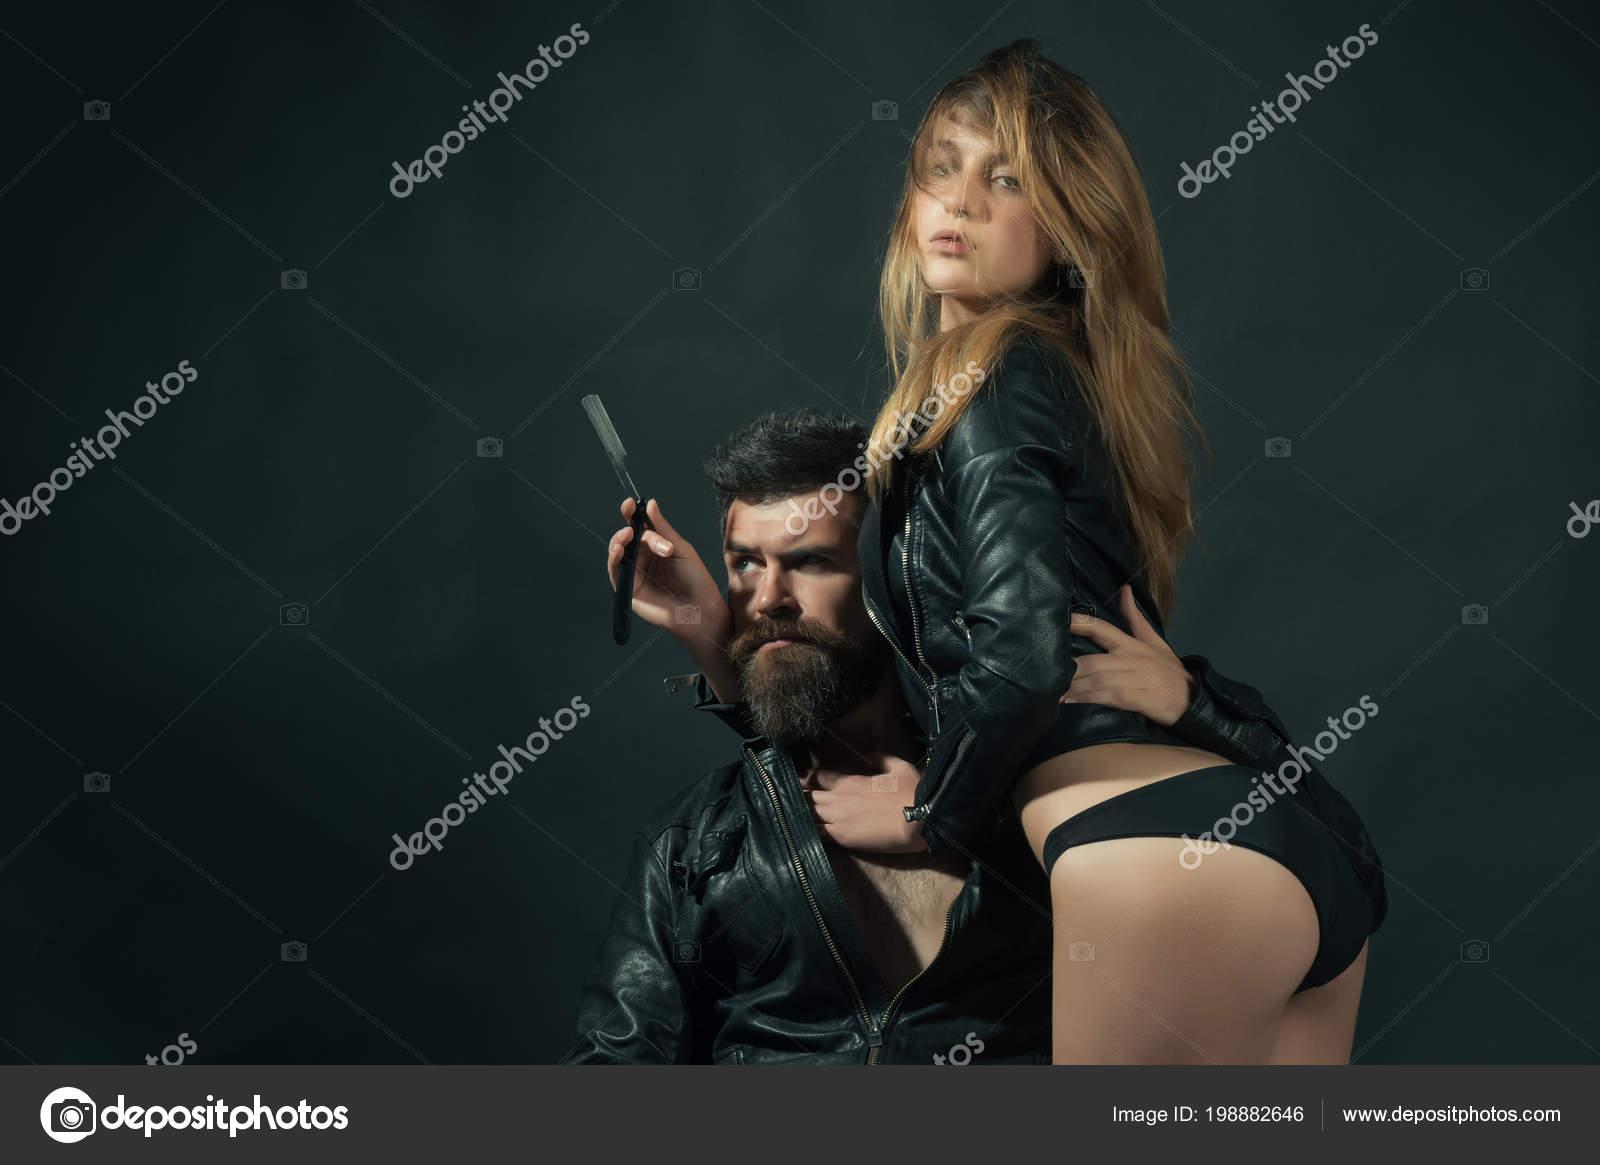 Sexy girl barber